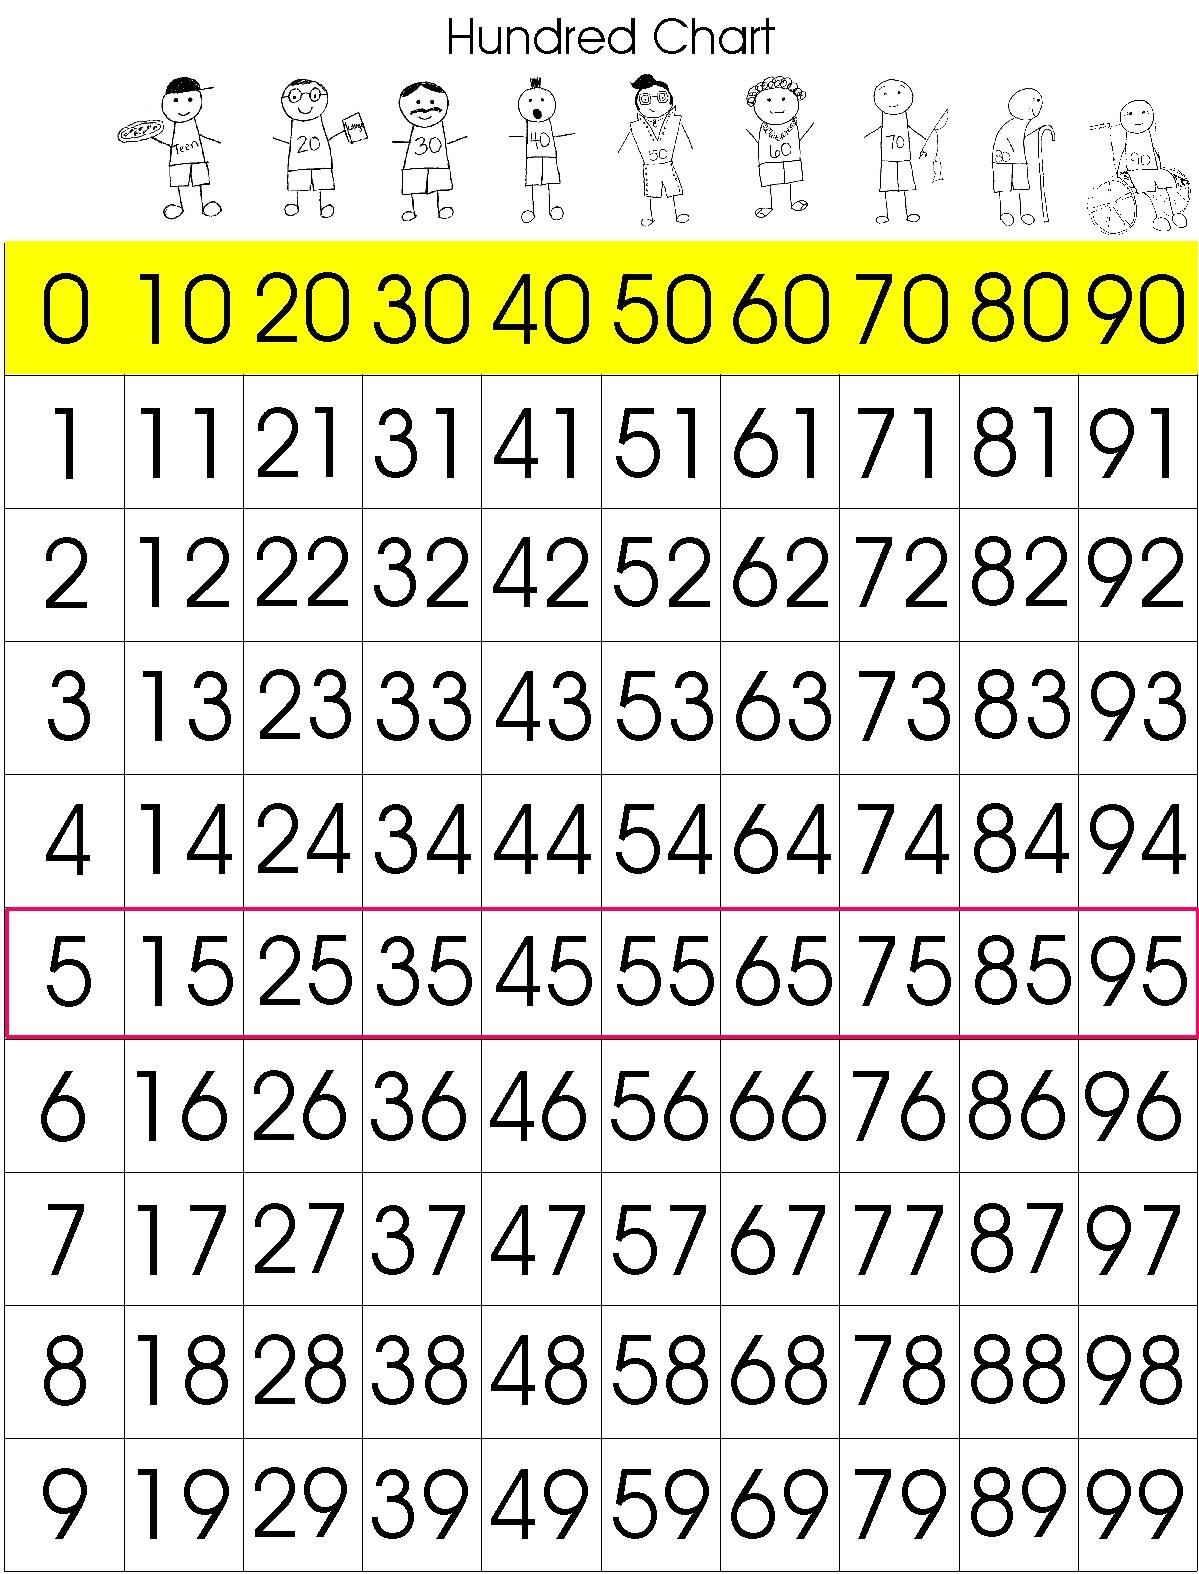 Hundreds Chart Pdf Copy of our hundreds chart